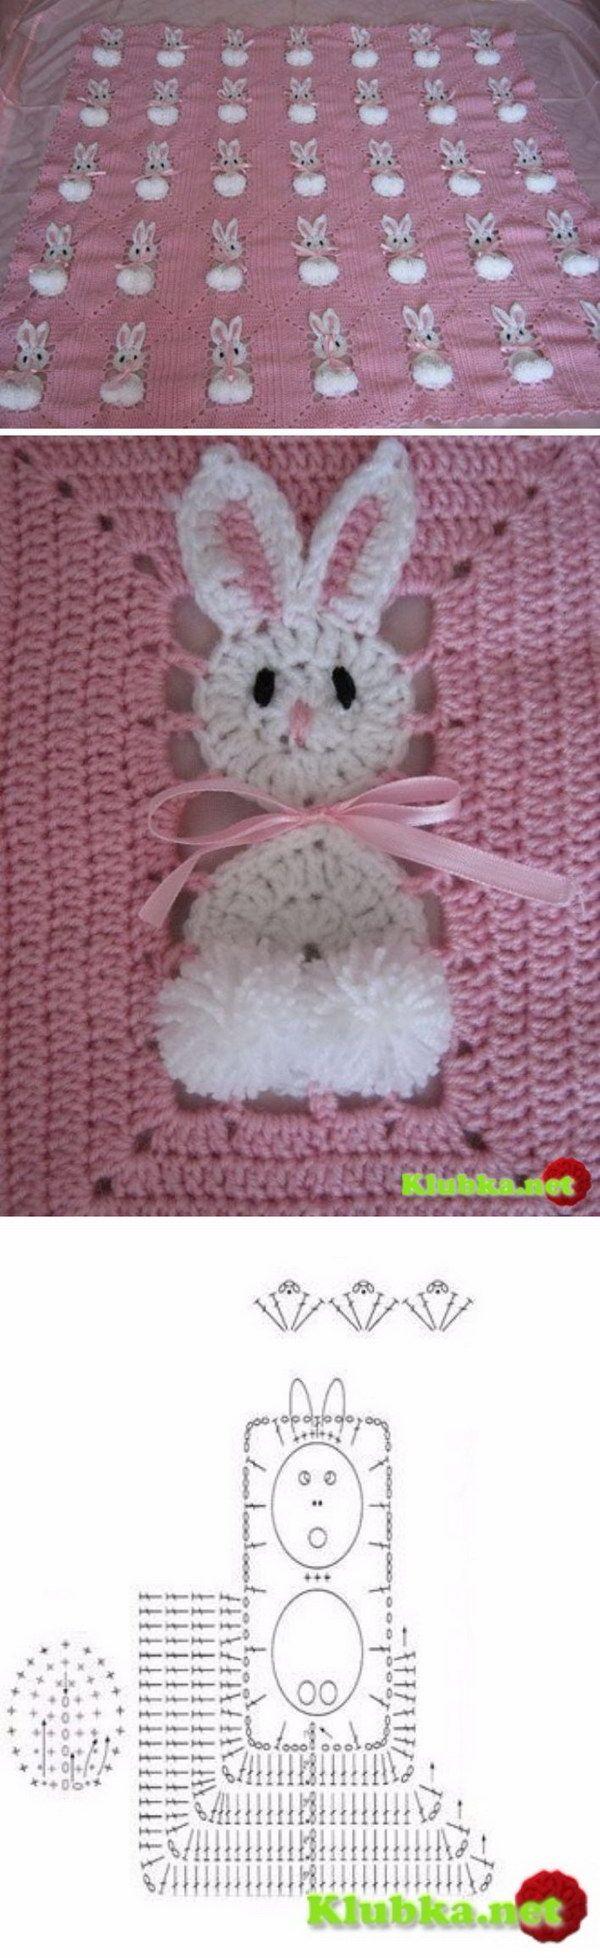 Moderno Crochet Pescador Patrón Afghan Ideas - Ideas de Patrones de ...